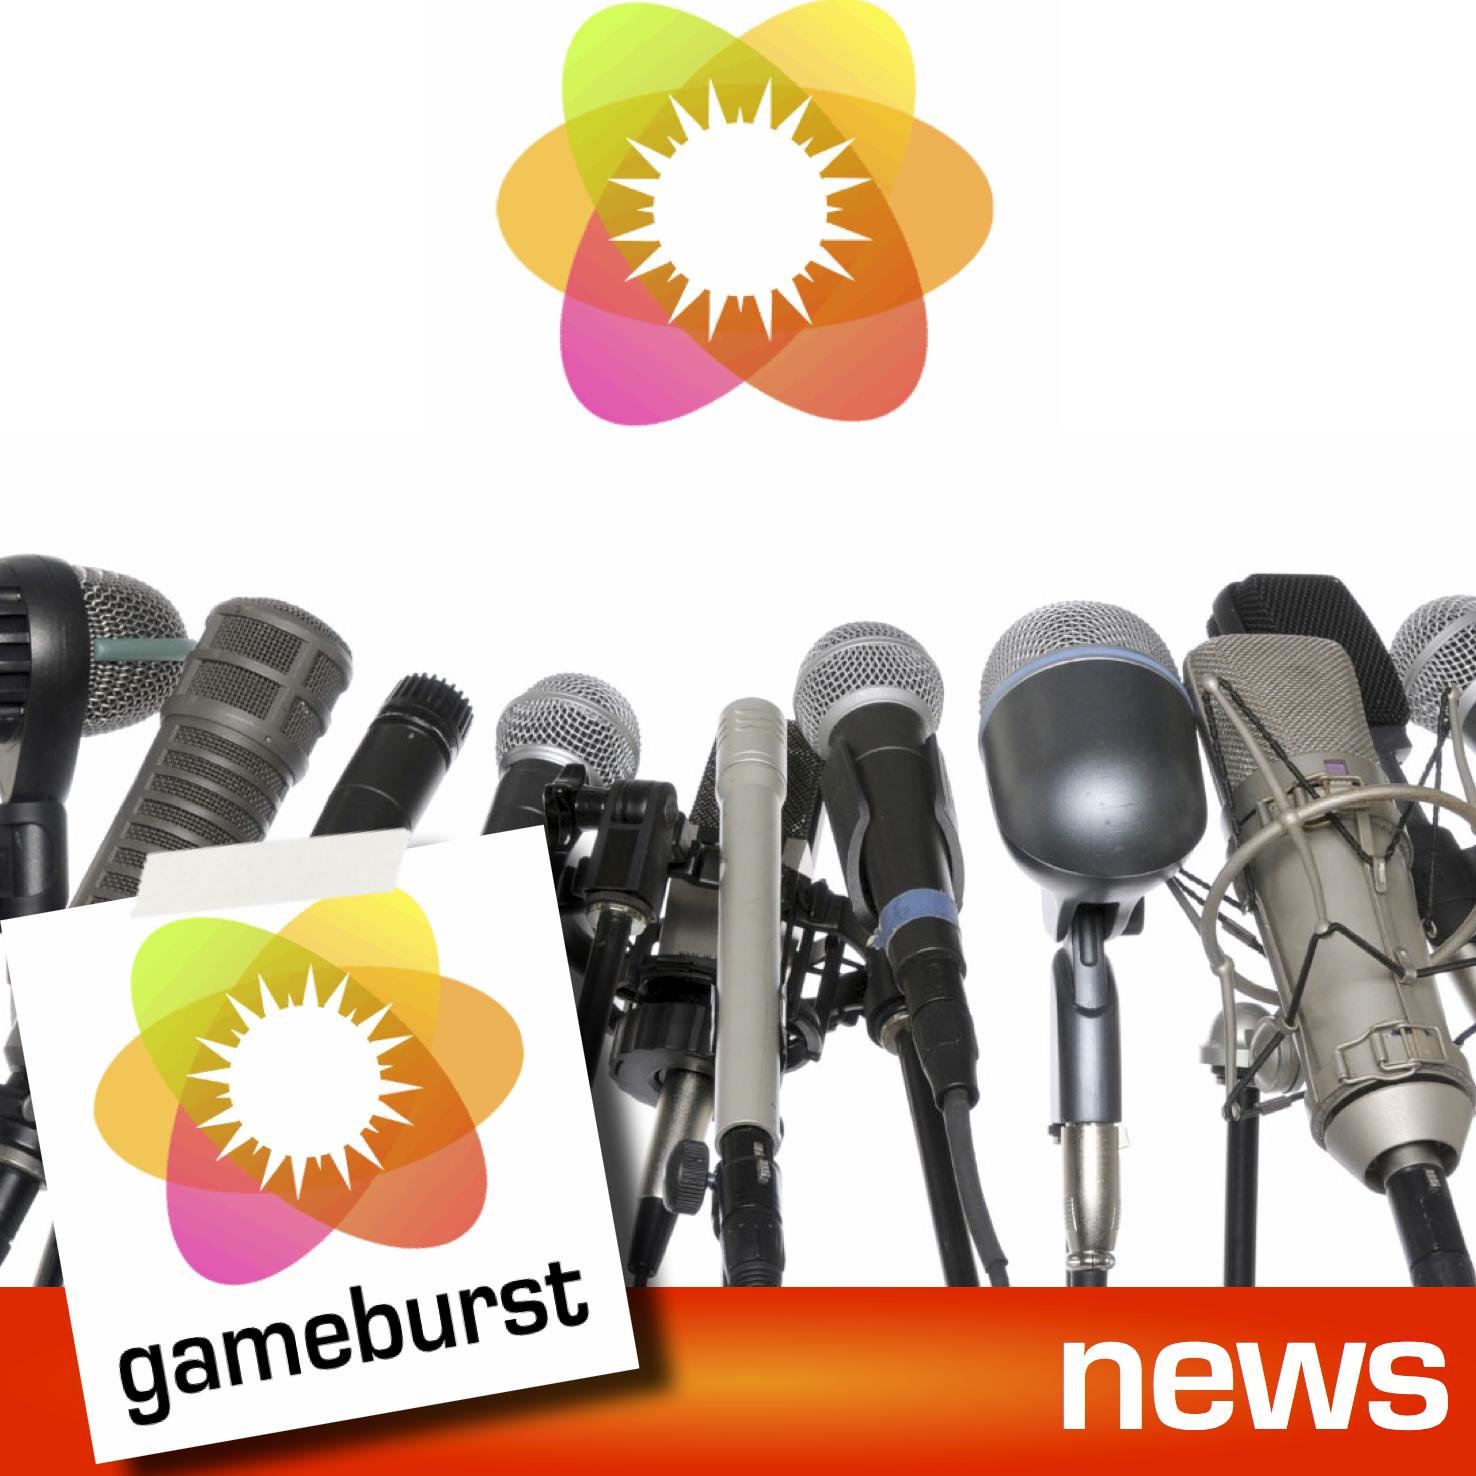 GameBurst News - August 26th, 2012